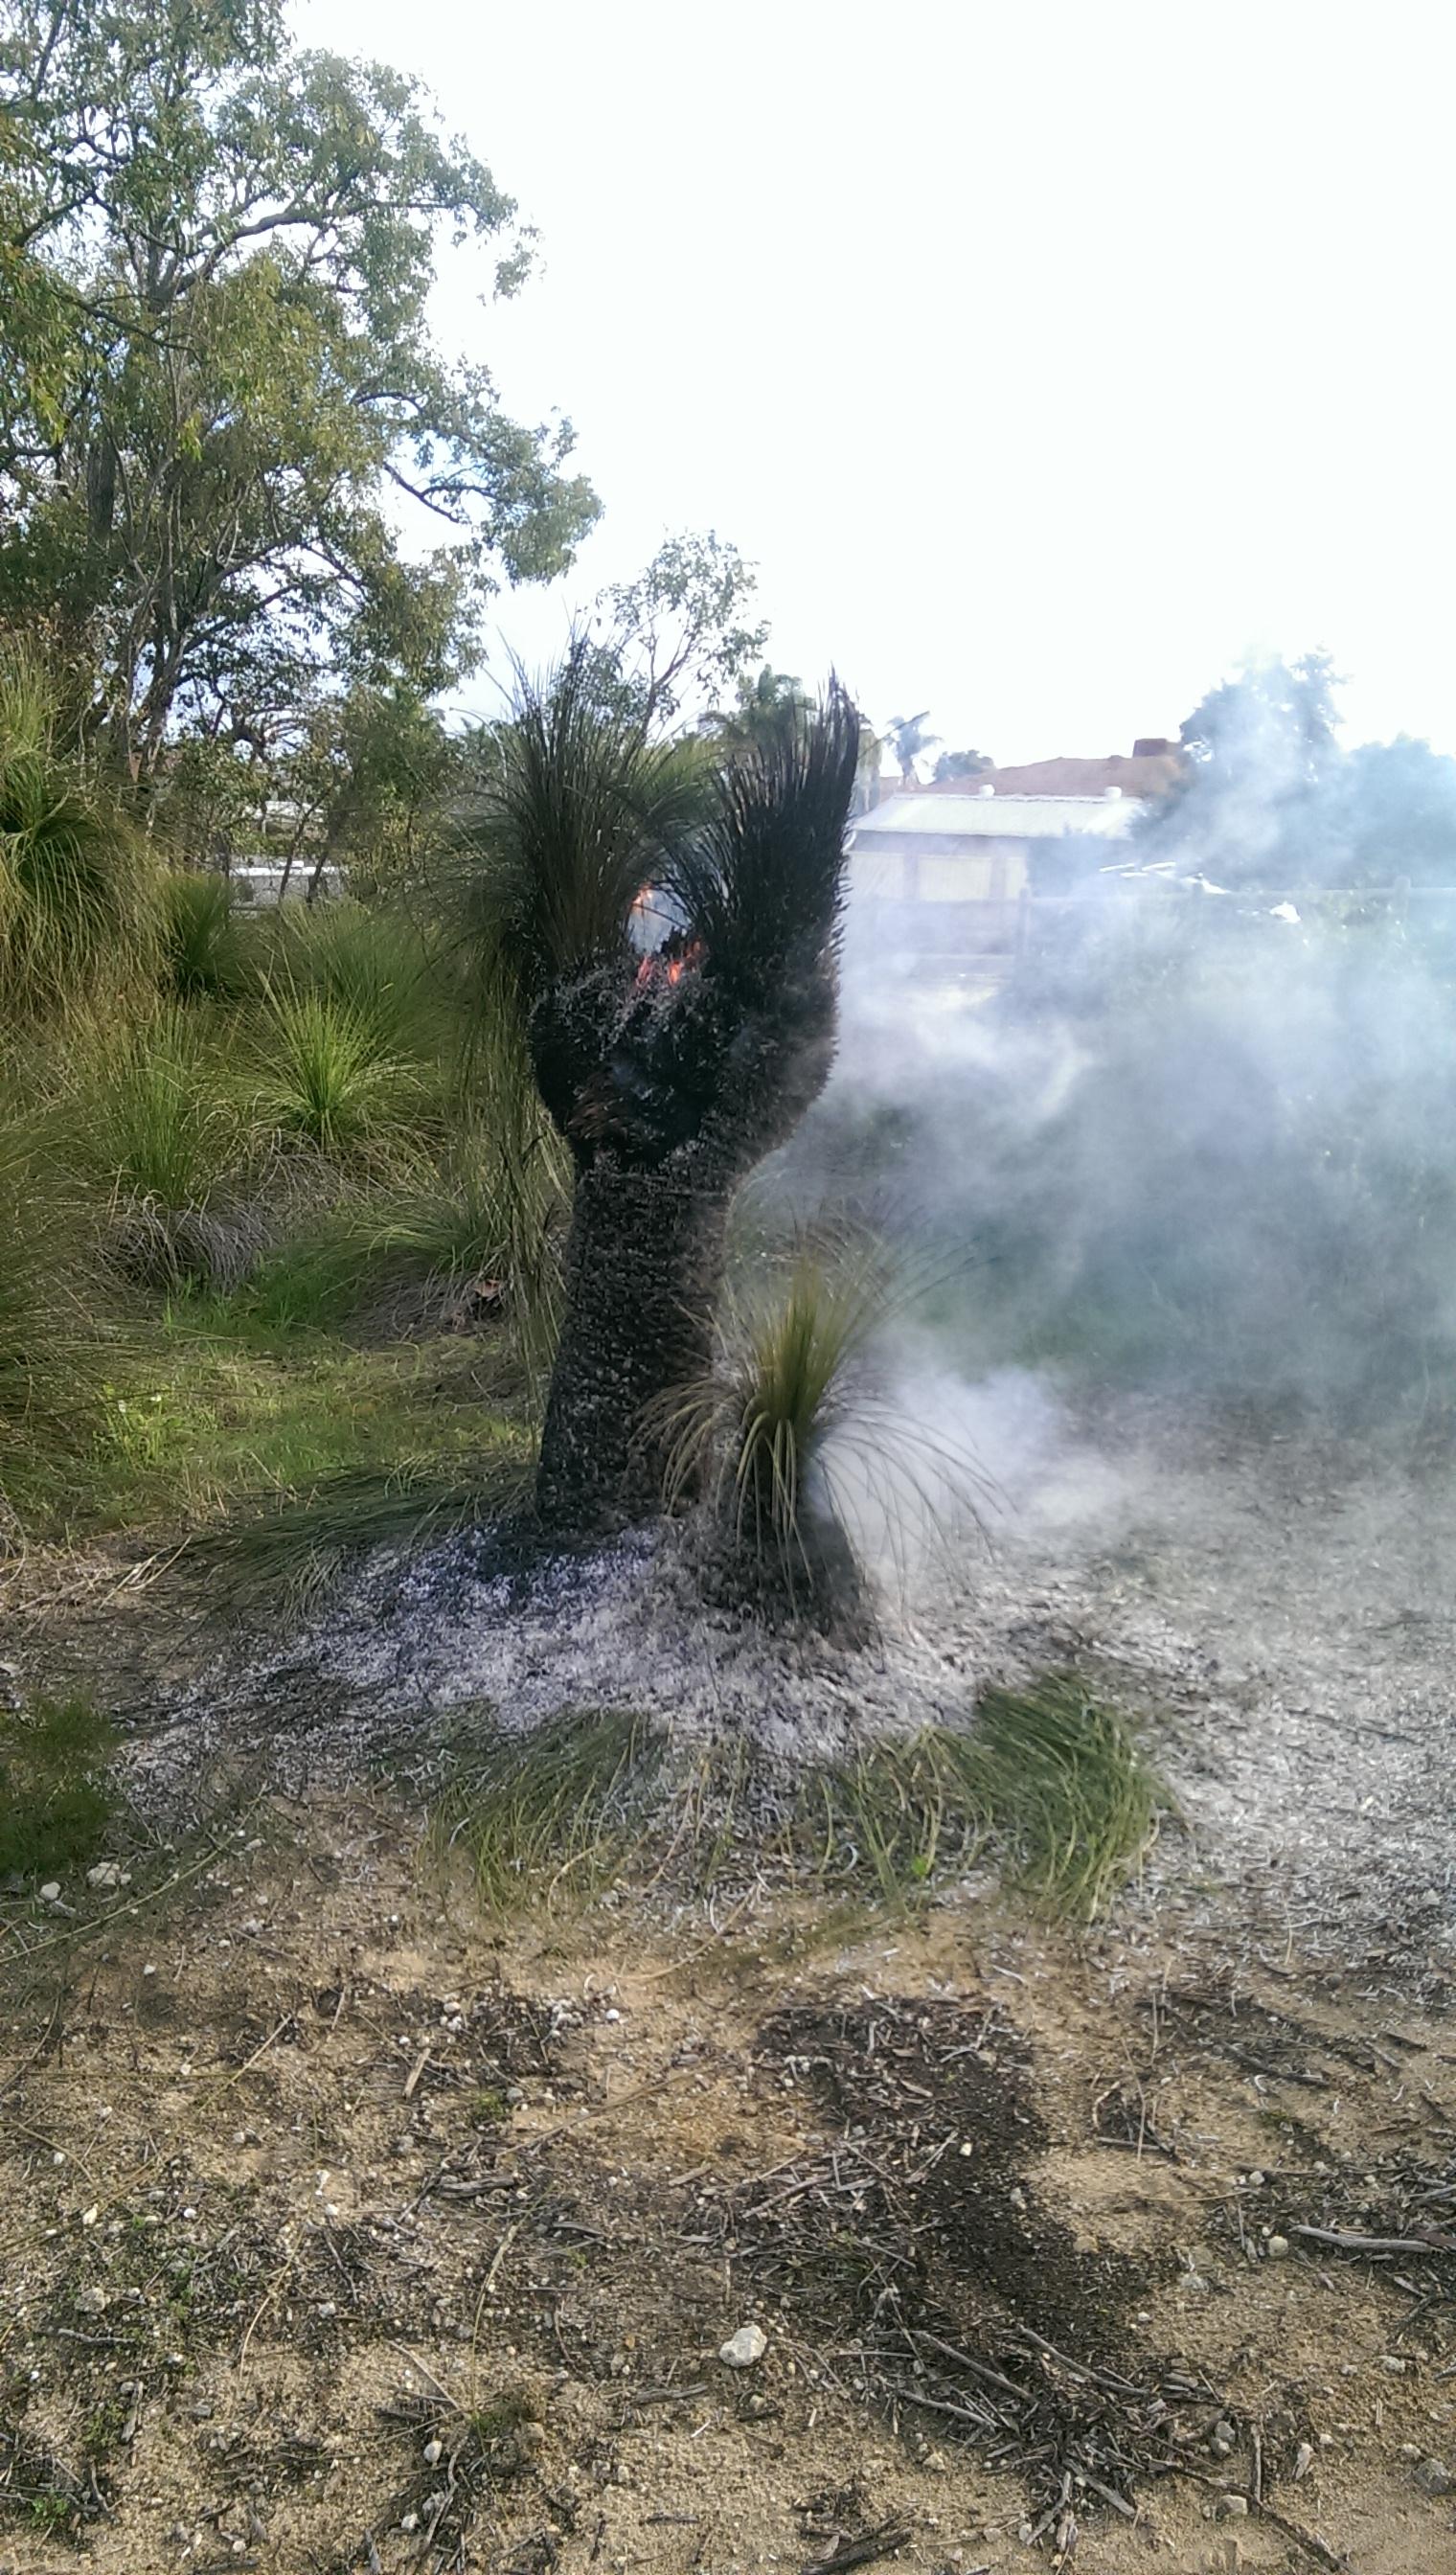 Grasstree on fire1